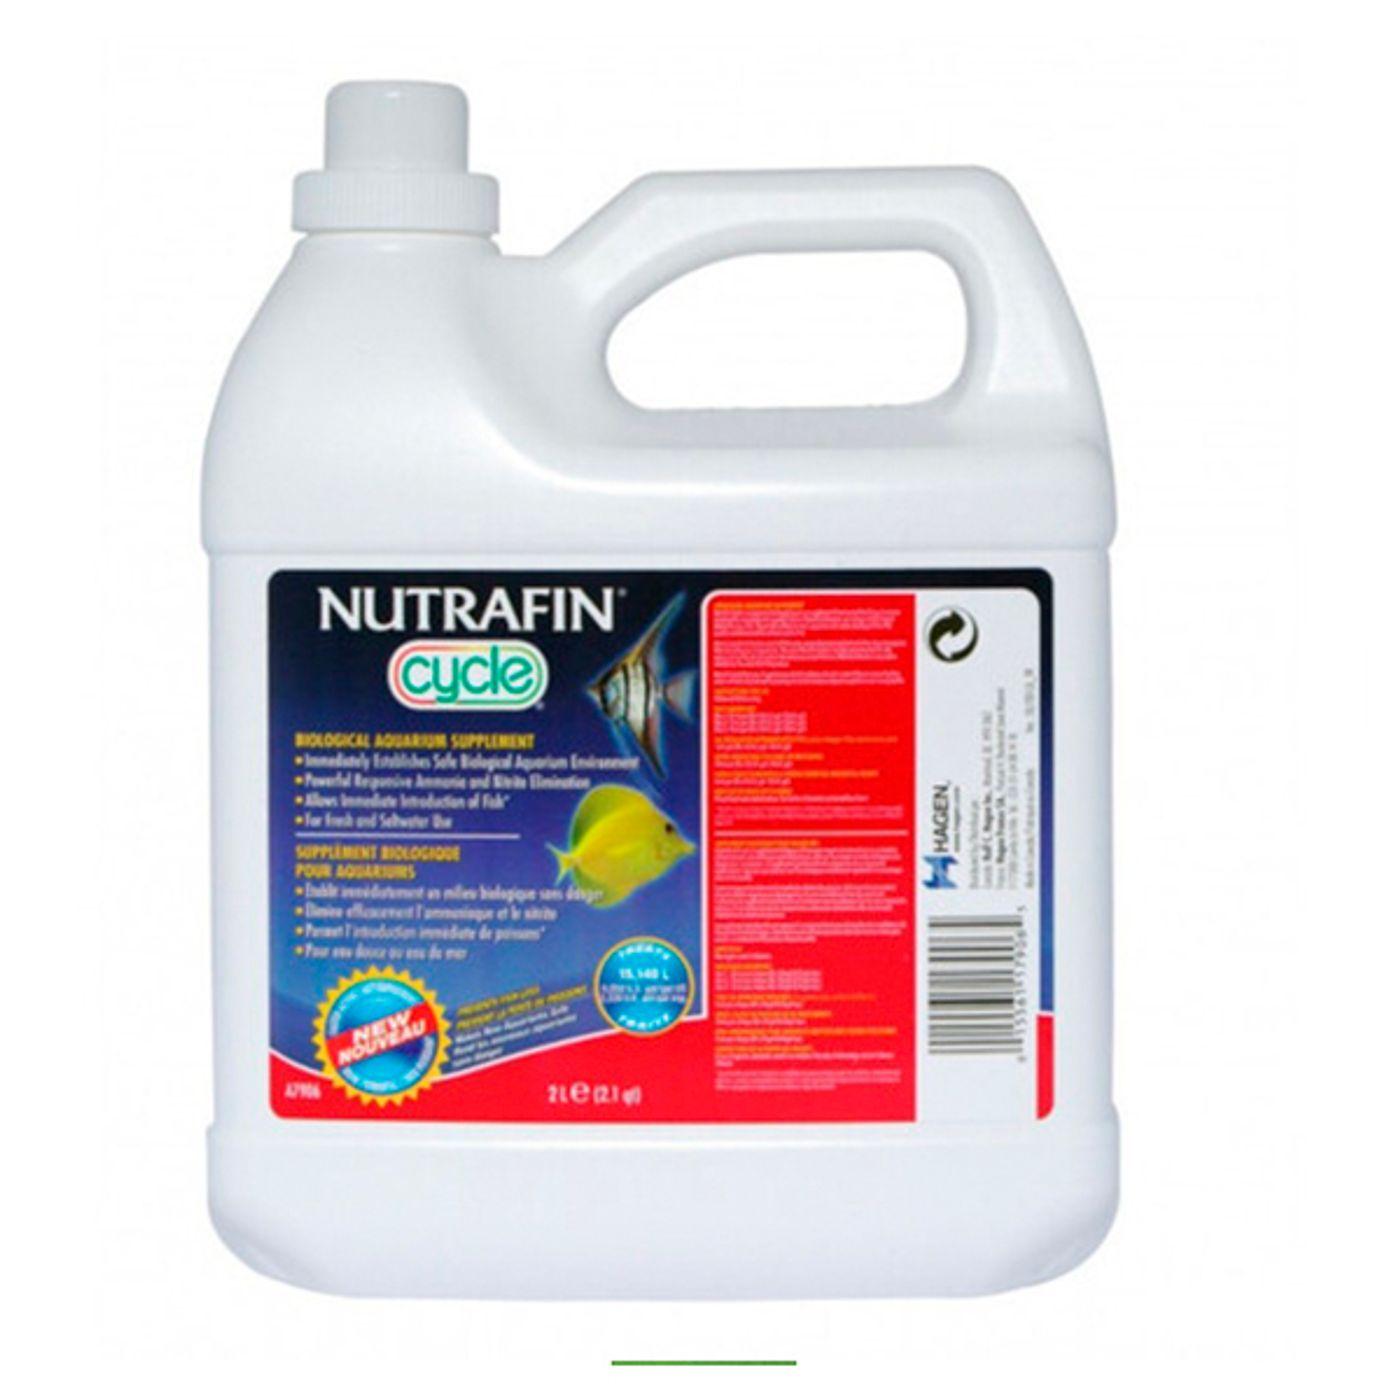 NUTRAFIN-Cycle-Bio-Power-2L